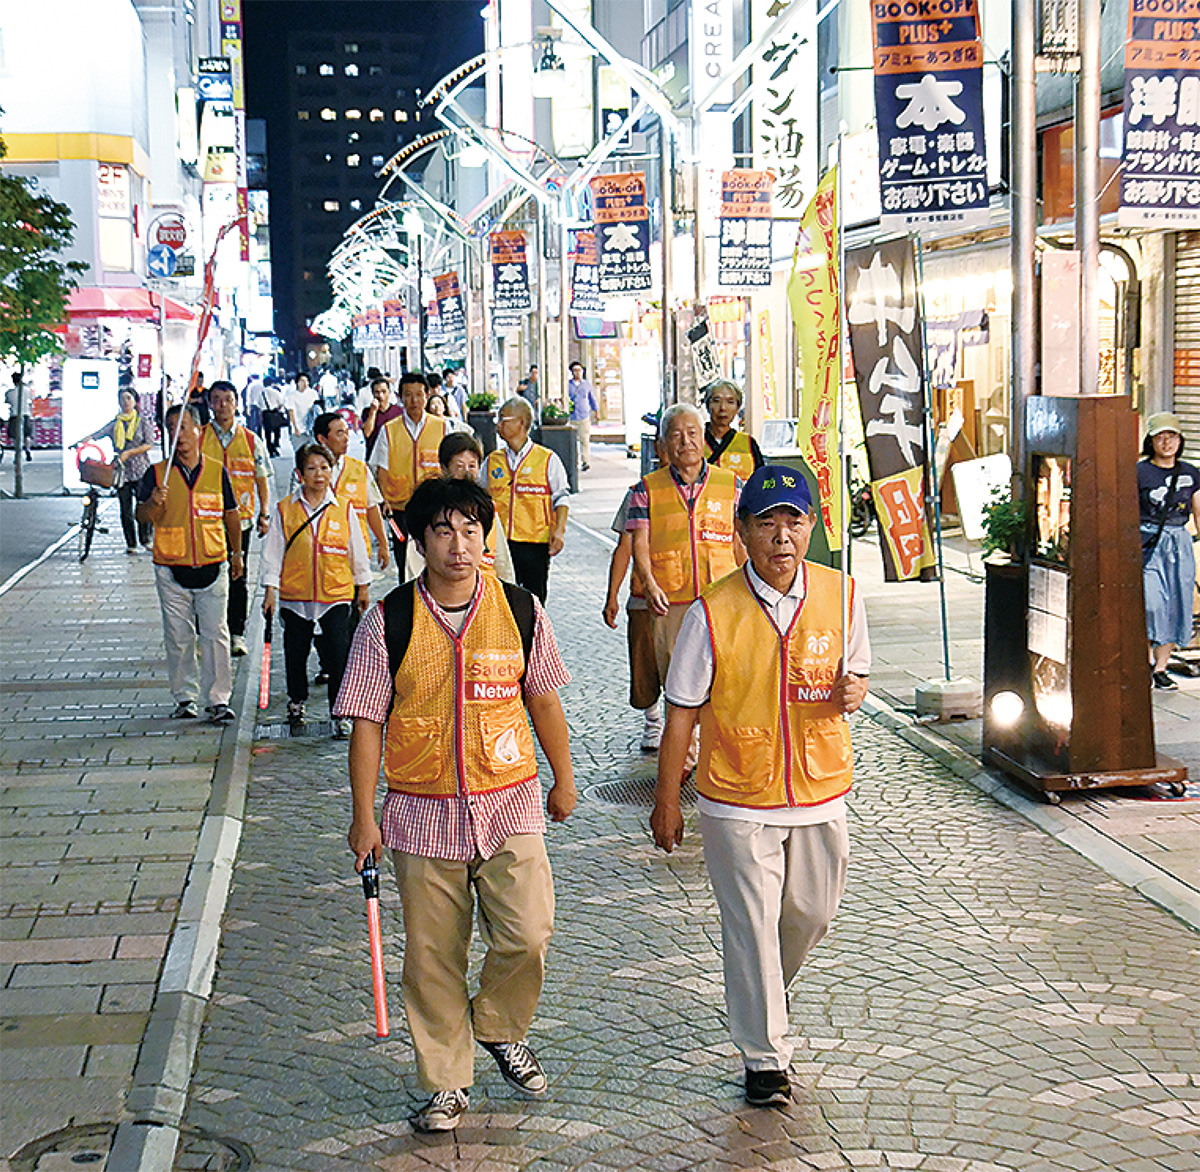 SC活動の象徴ともいえる、黄色いセーフティベストを着て本厚木駅周辺をパトロールする関係者